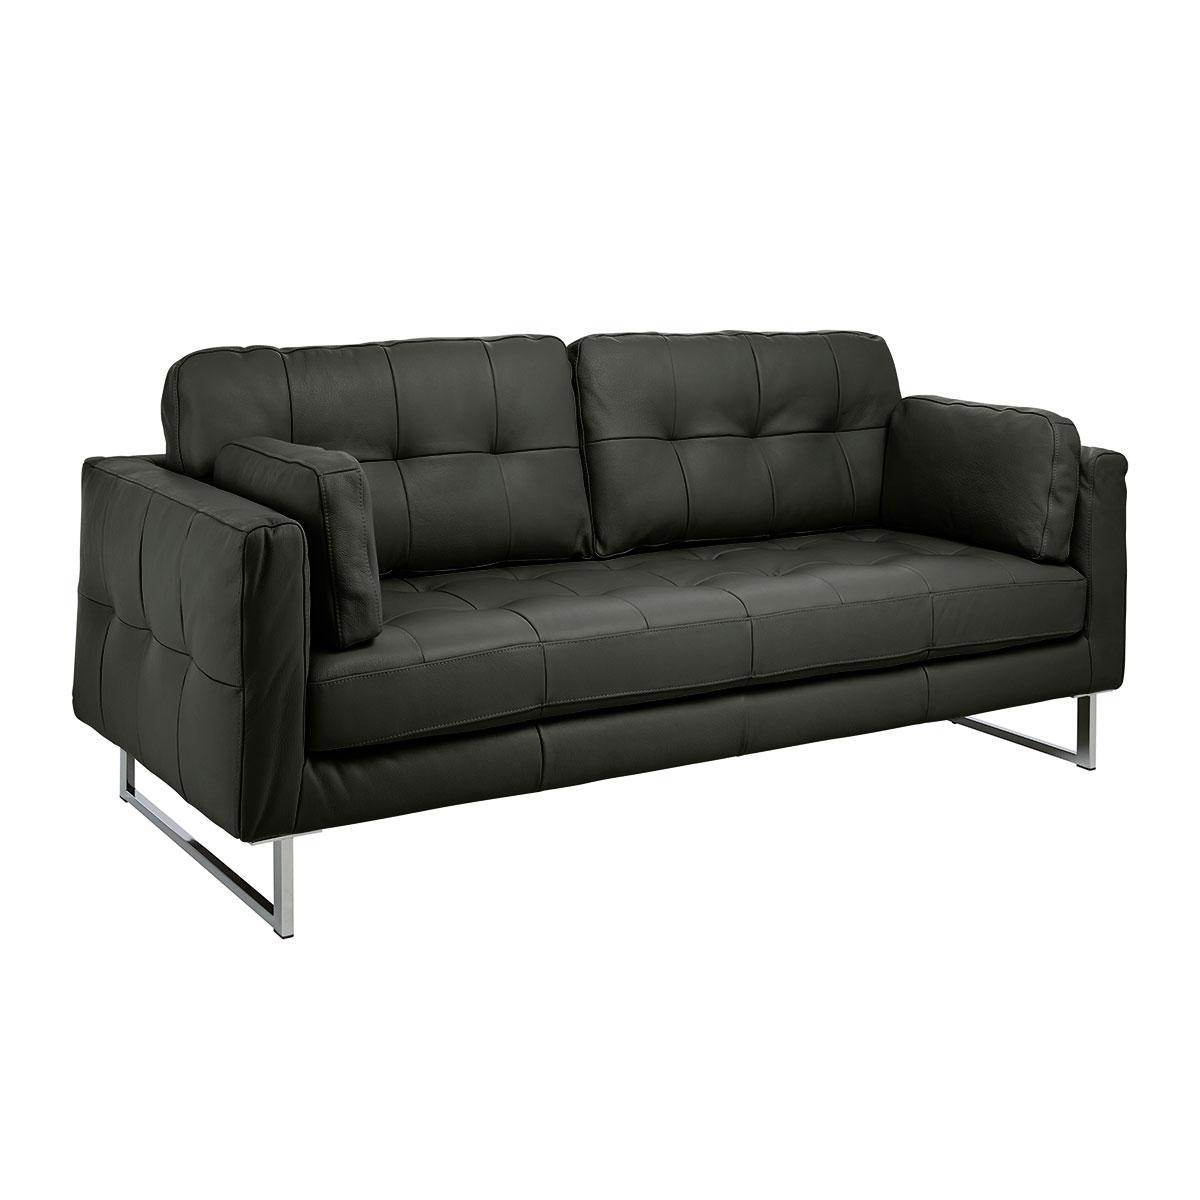 Paris II three seater sofa mollis leather dark green